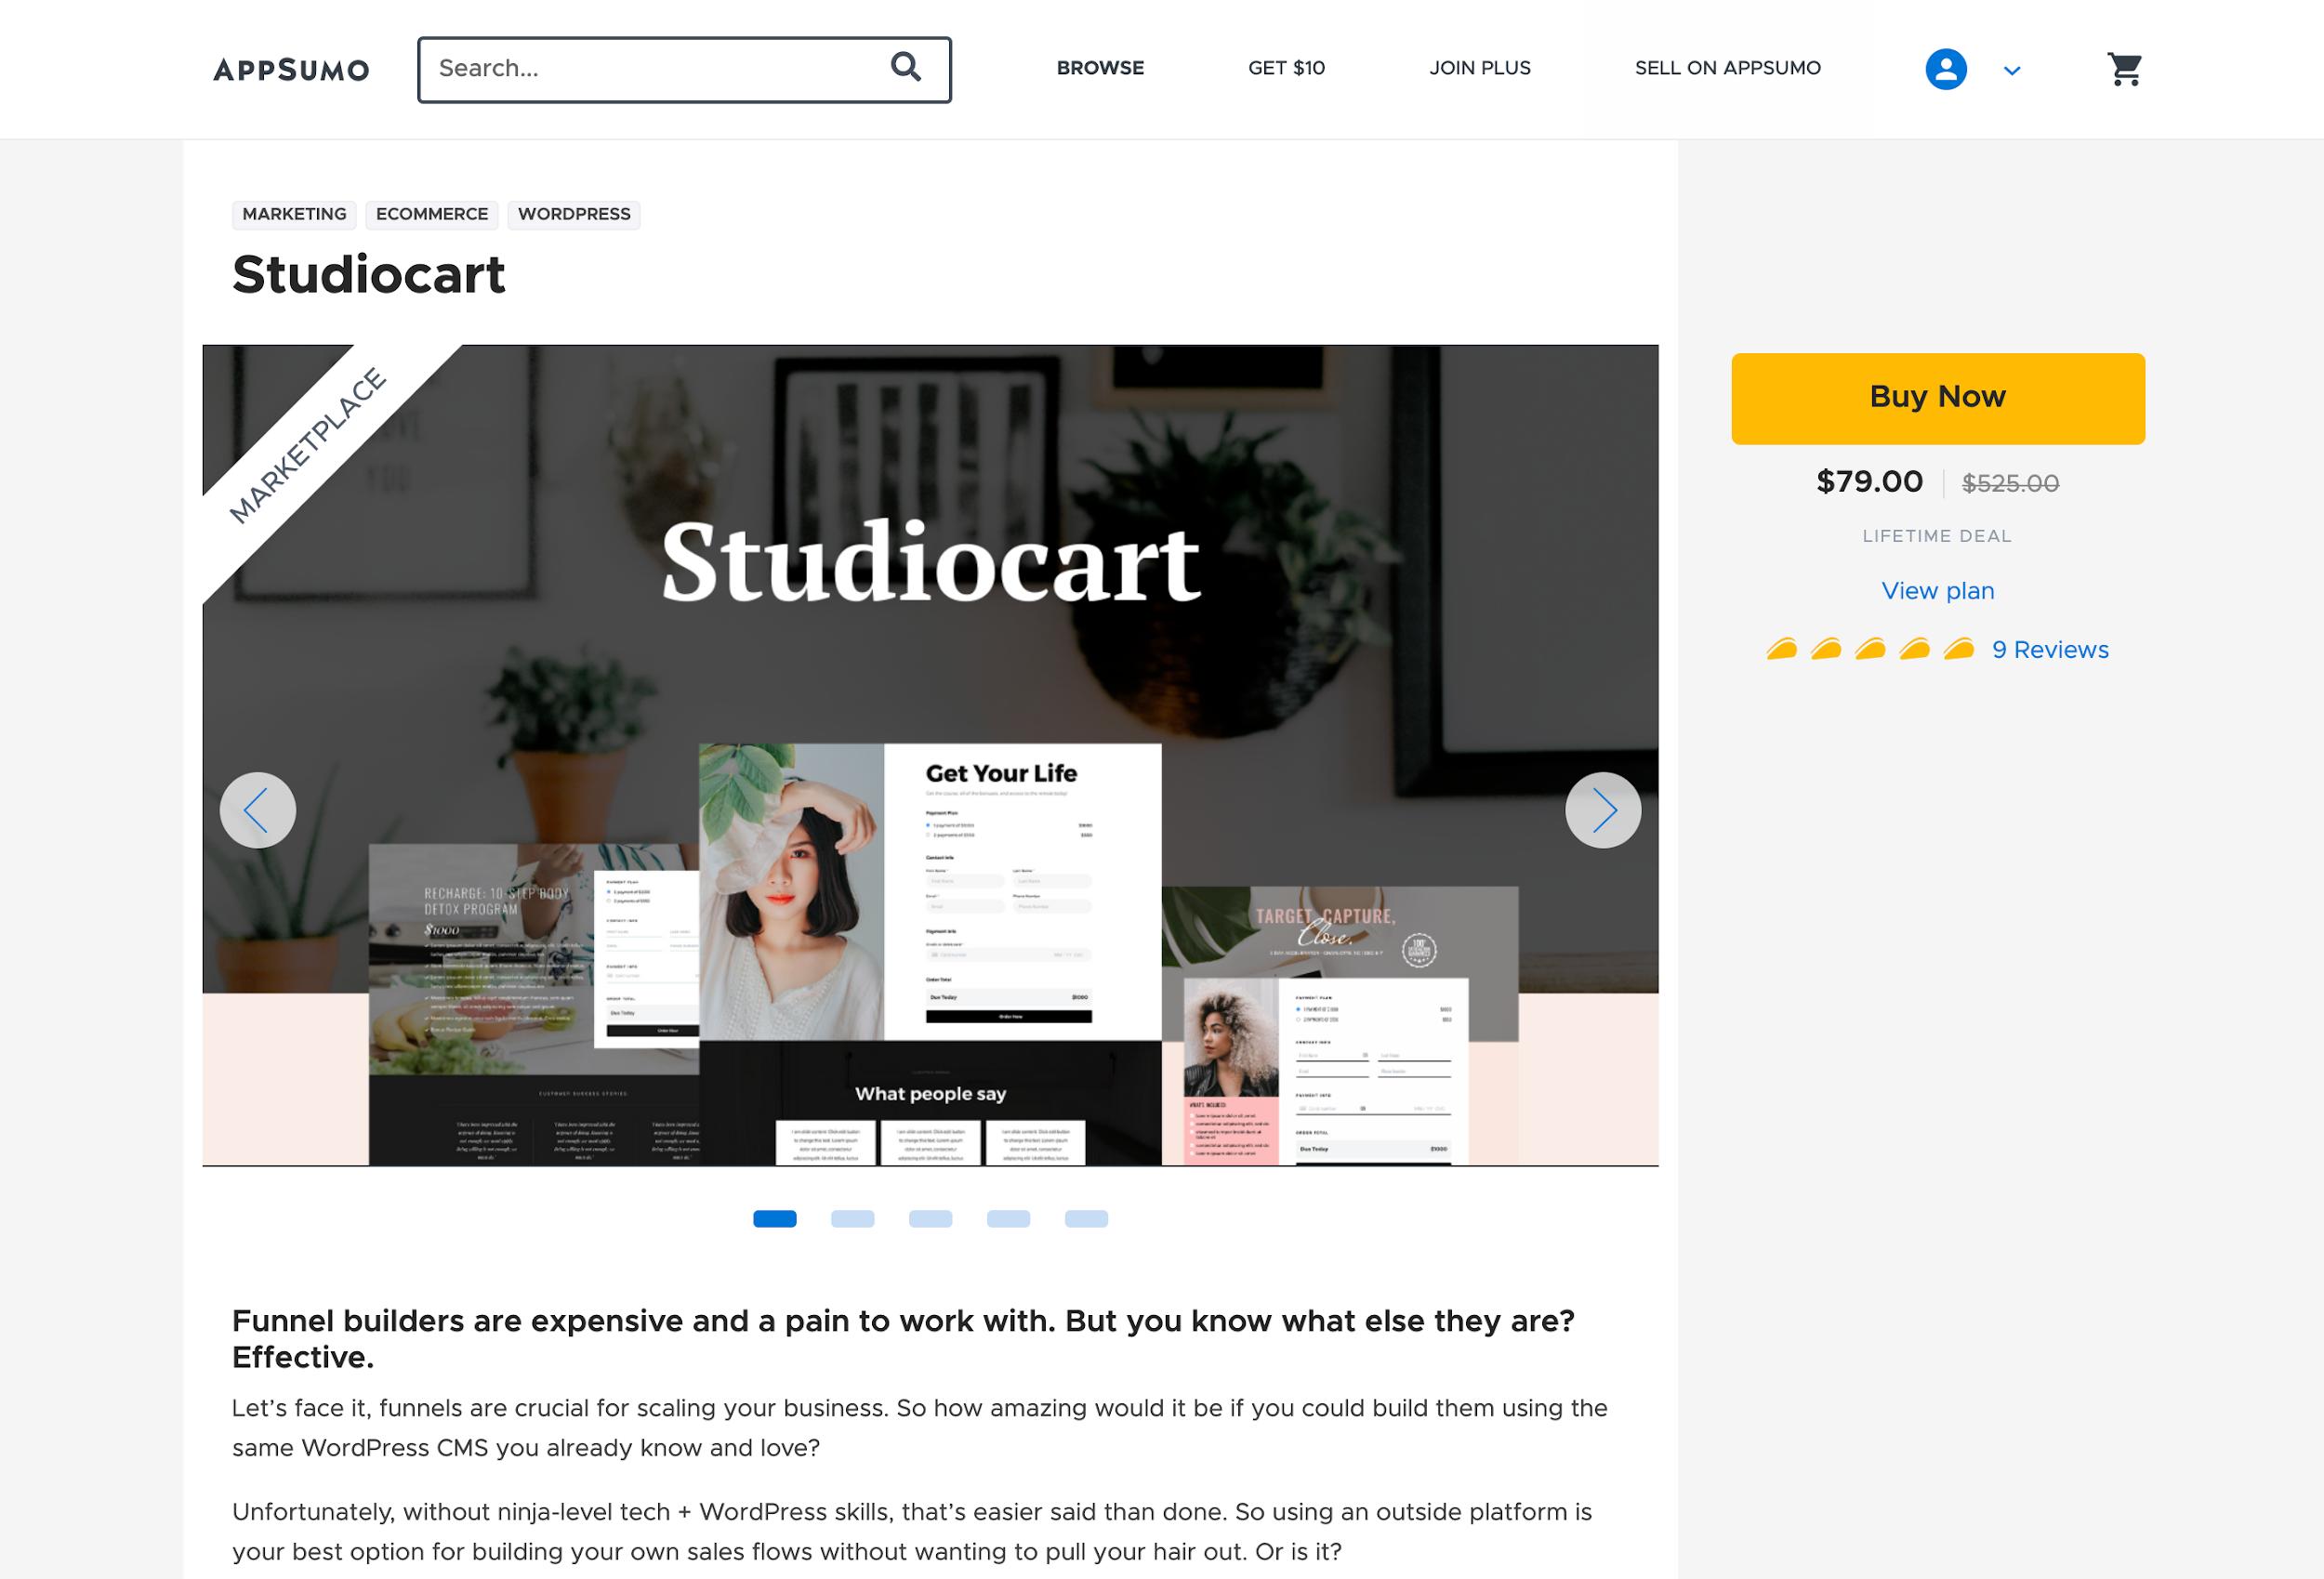 Studiocart AppSumo Marketplace Listing Page